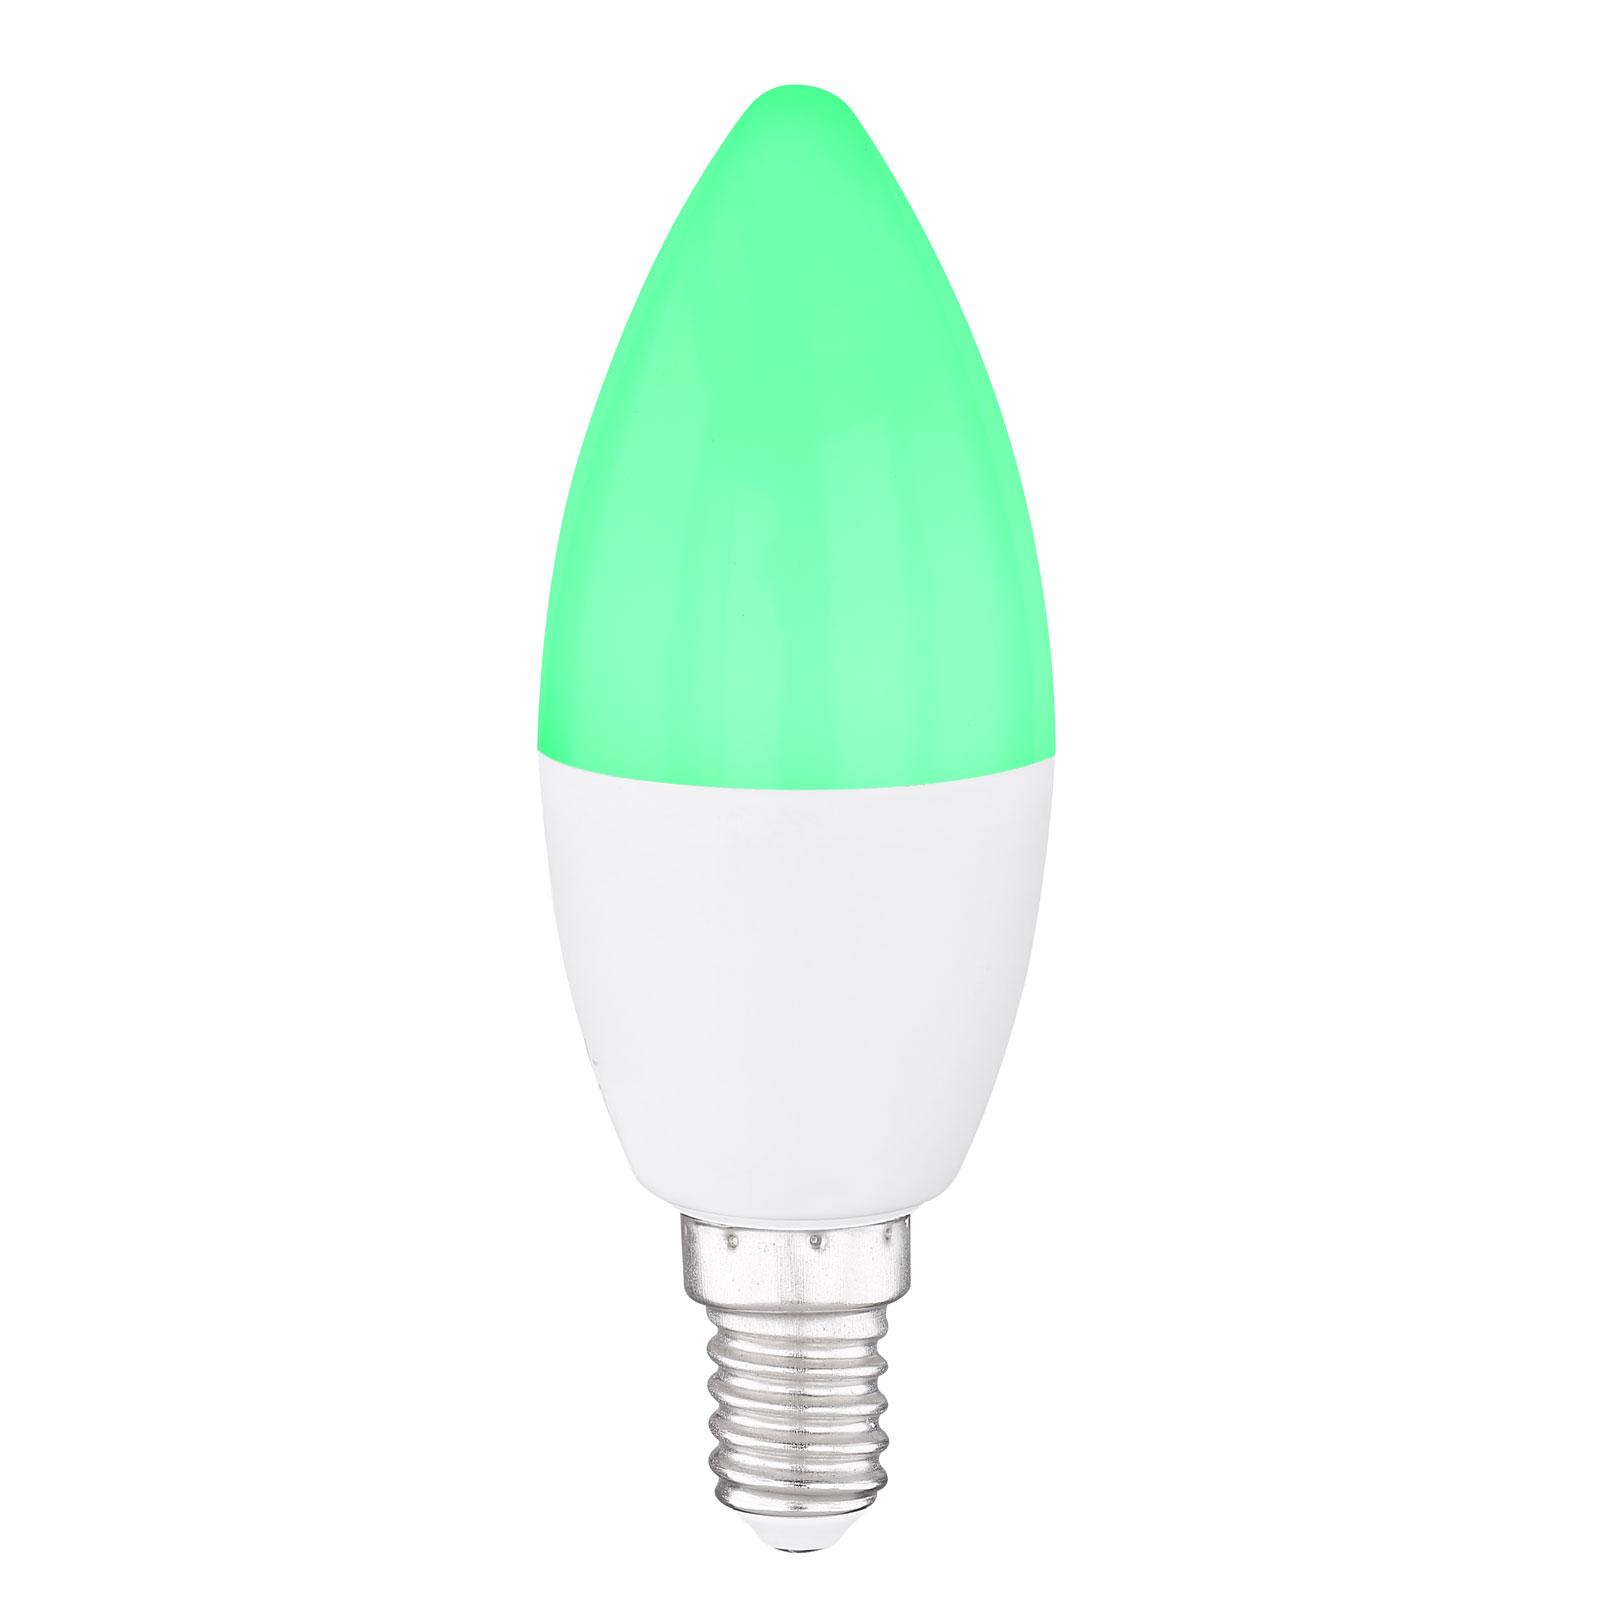 LED-Kerzenlampe E14, 4,5W Tuya-Smart RGBW CCT